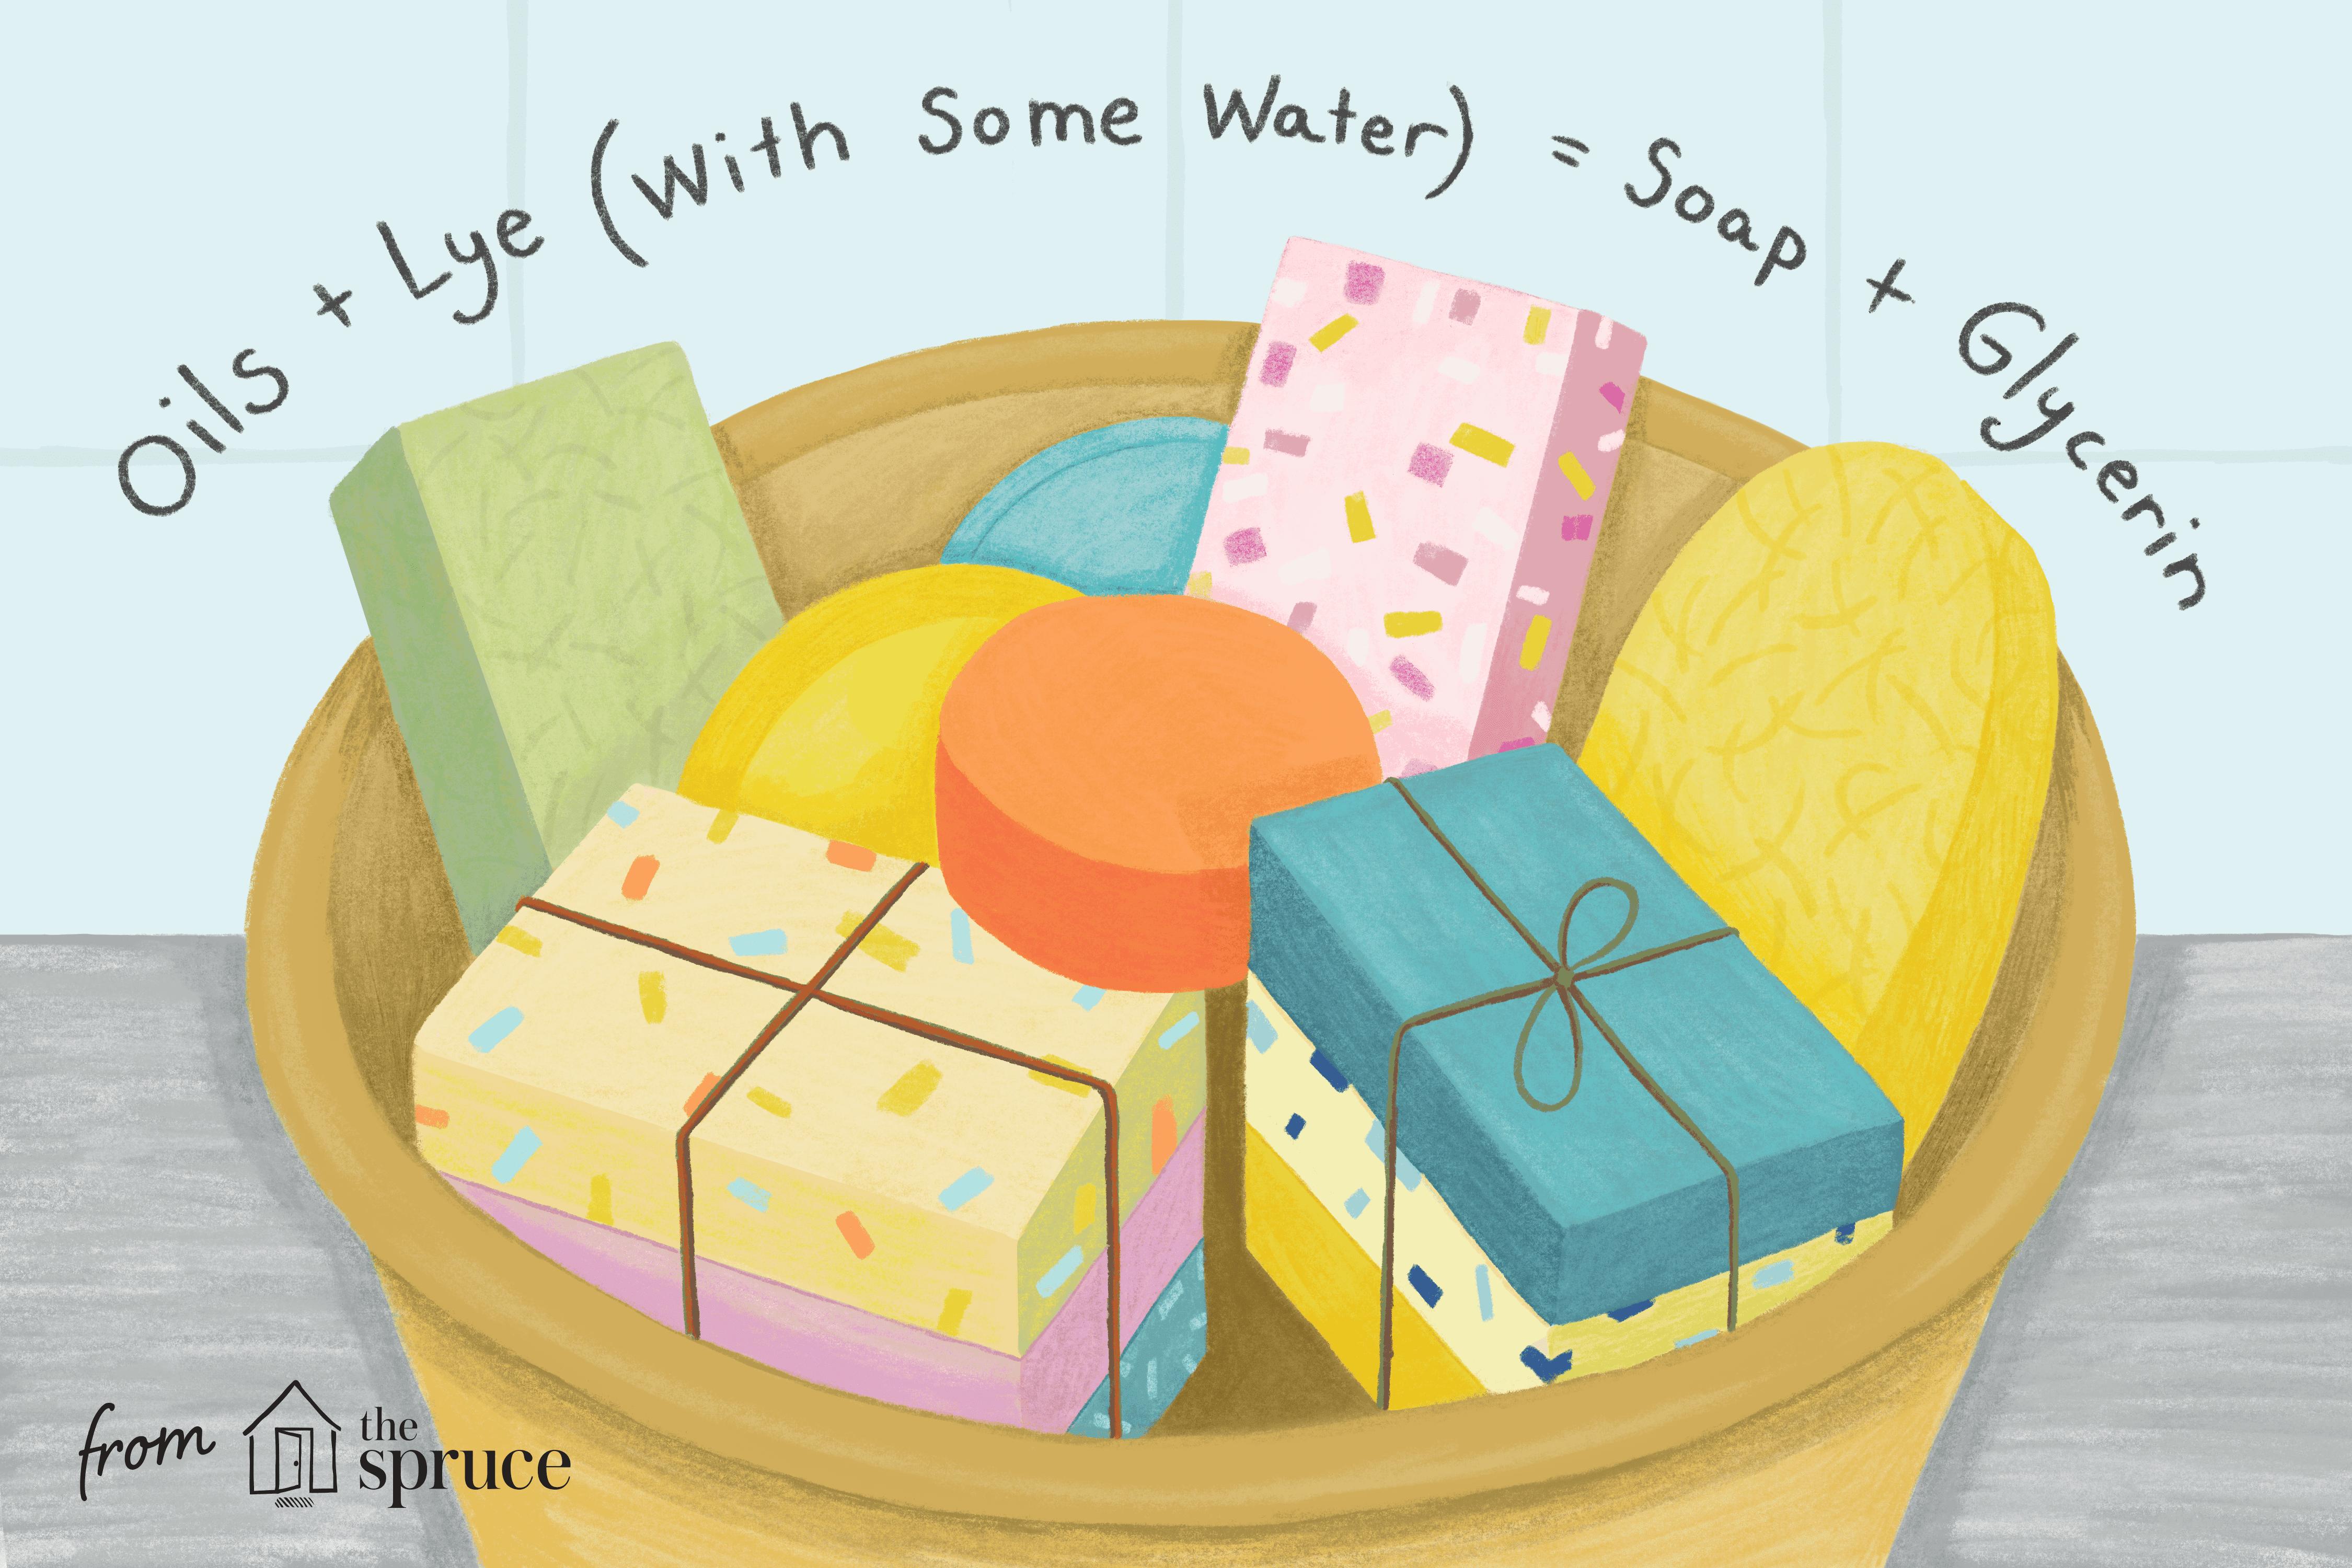 Illustration of glycerin soap